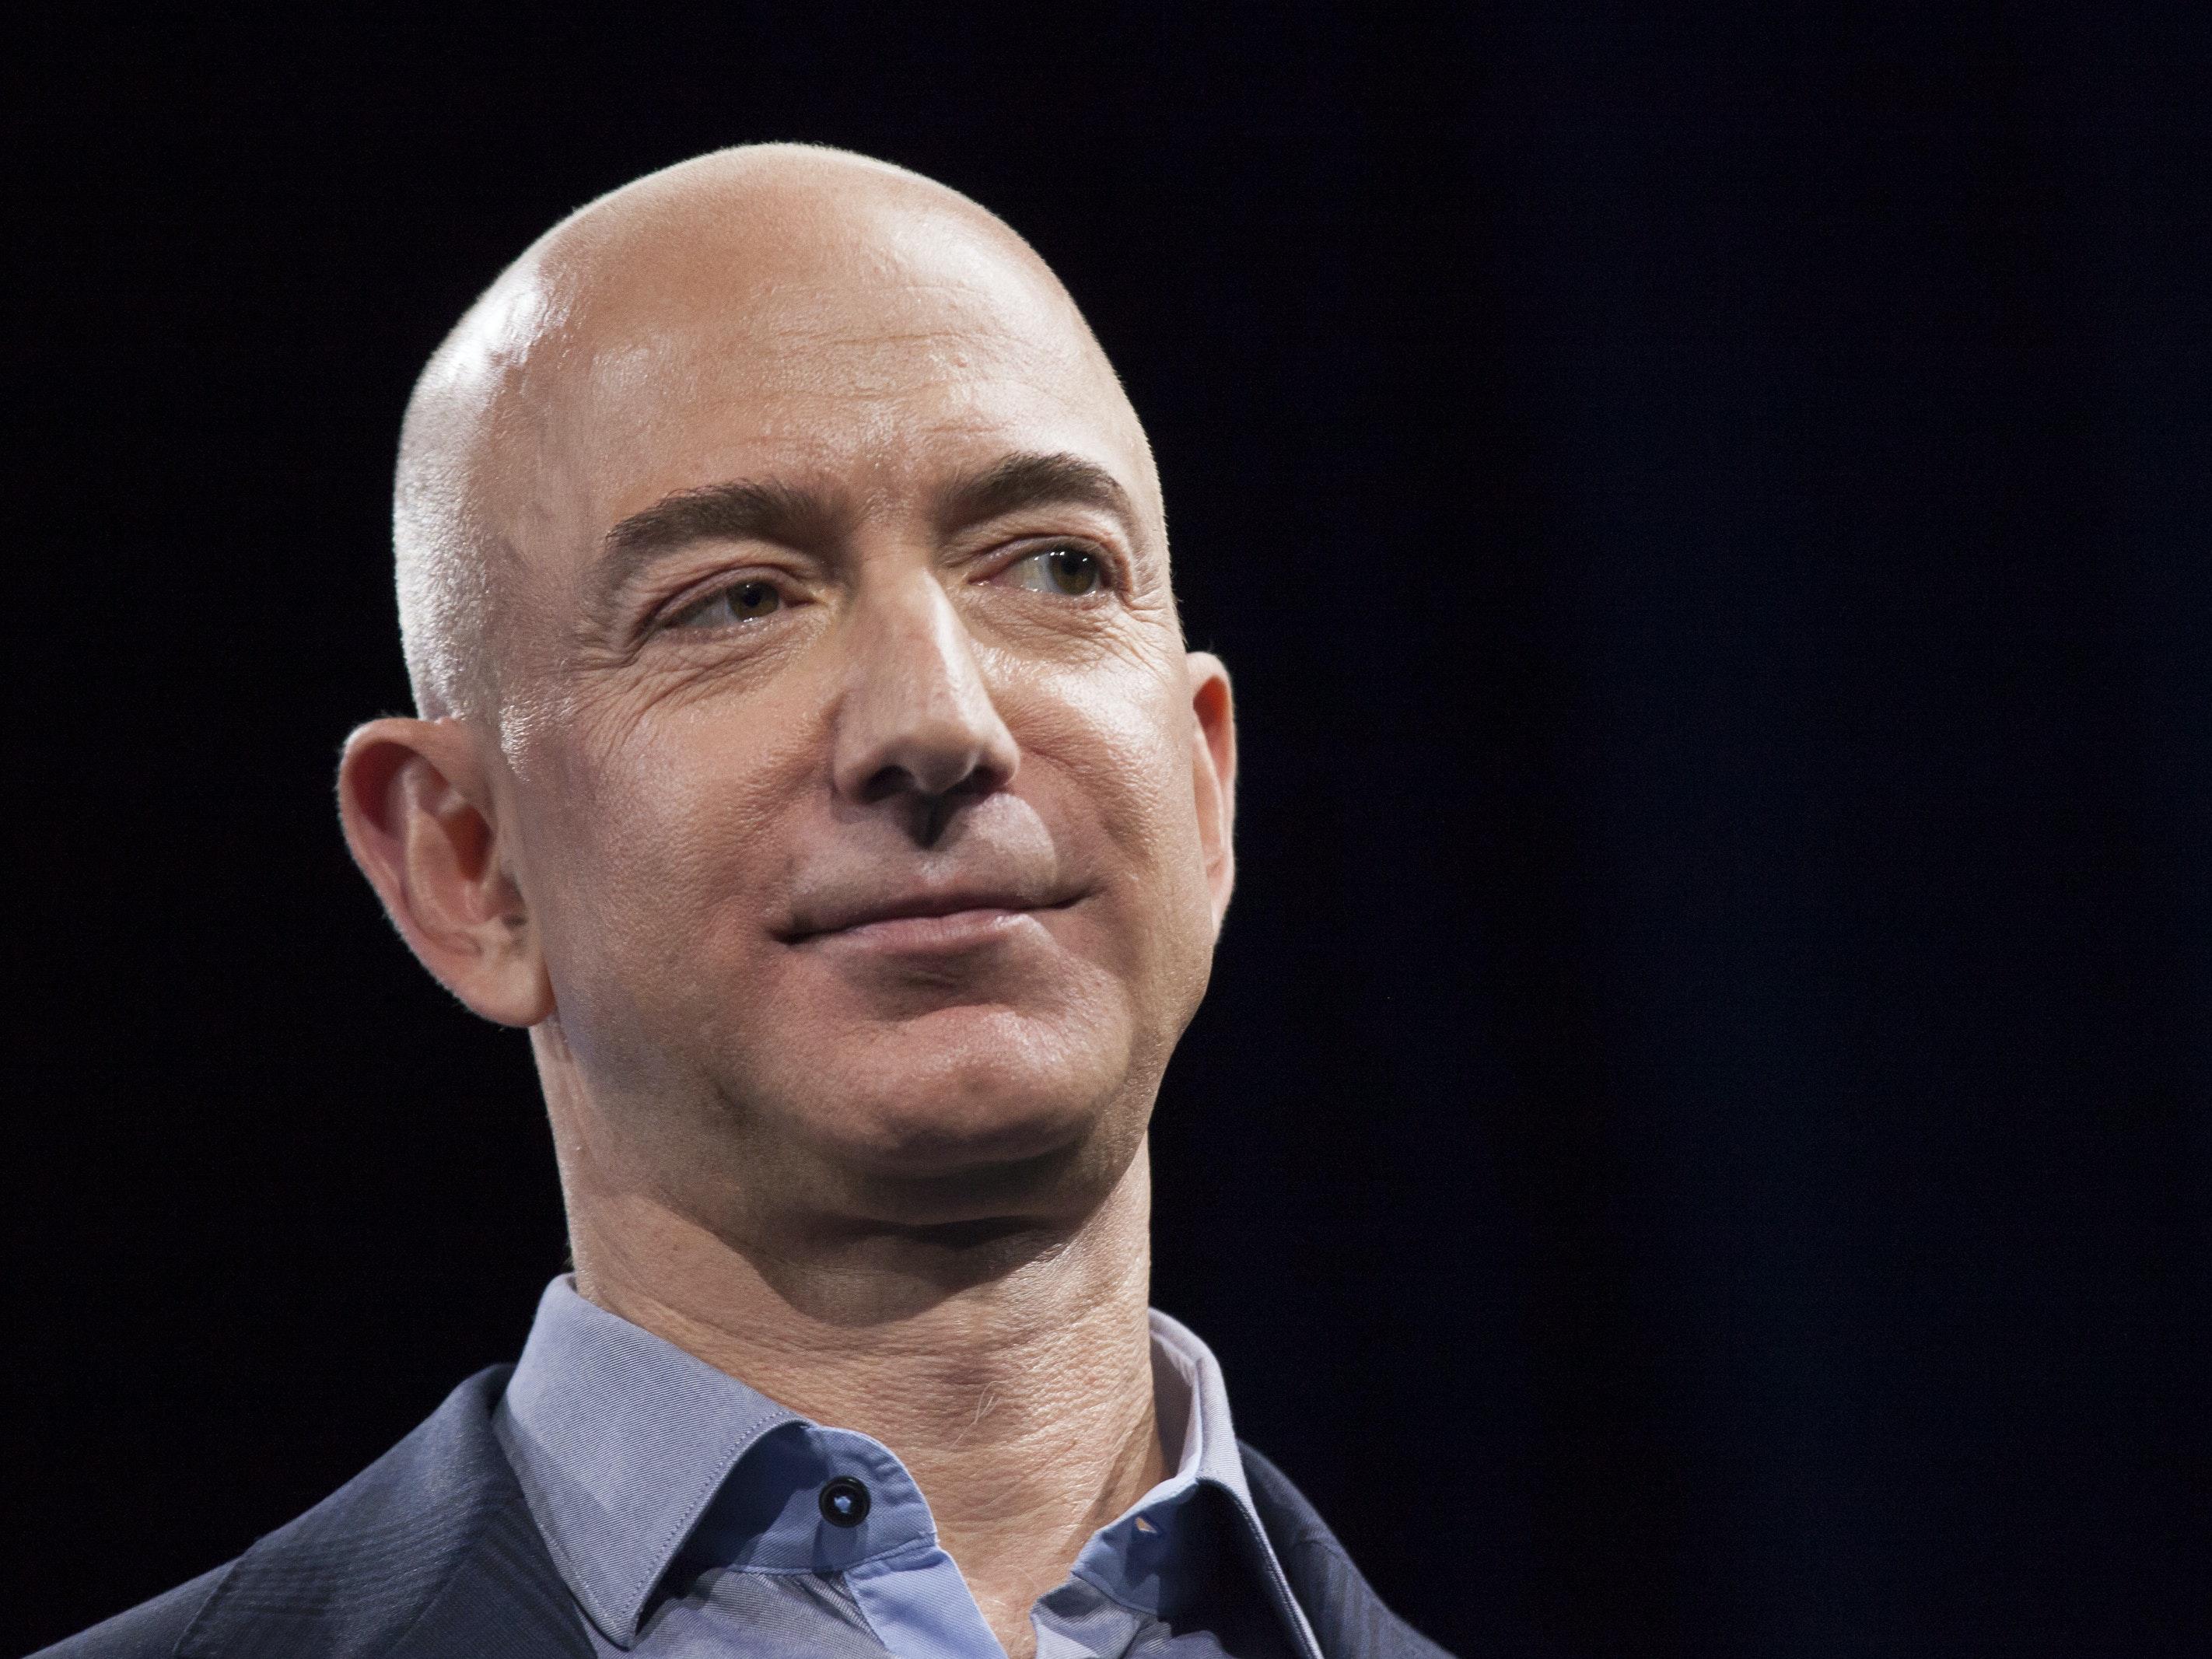 At $355 Billion, Amazon Is Still Worth More Than Denmark